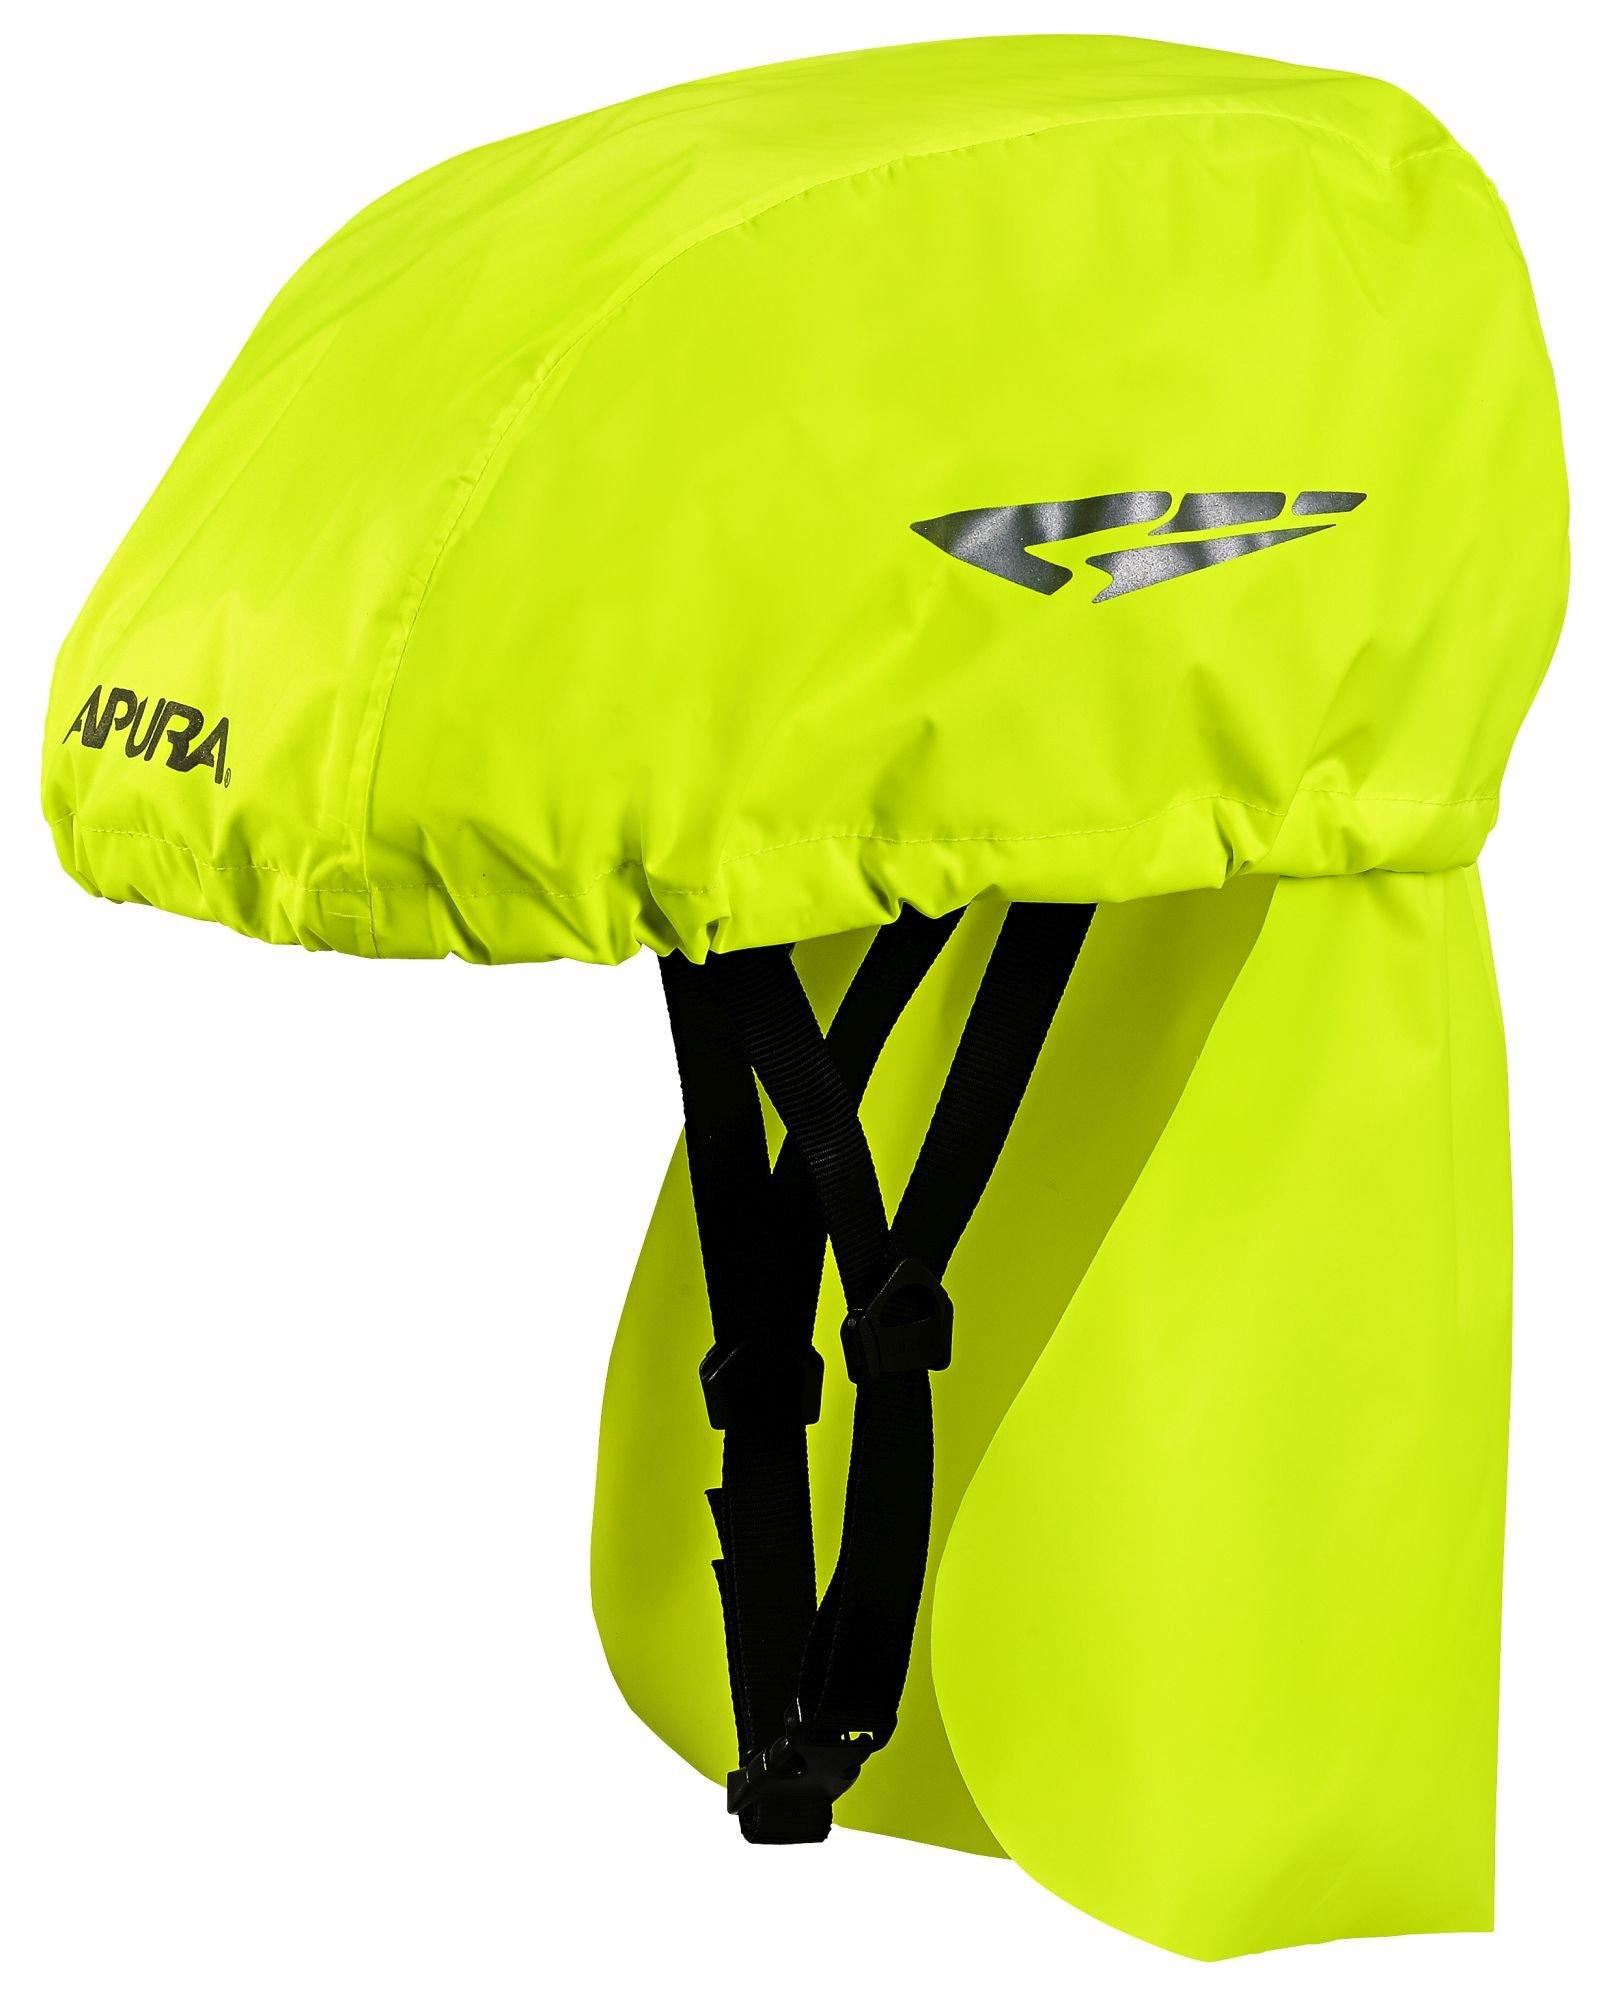 Apura Helmüberzug Barrier Shield